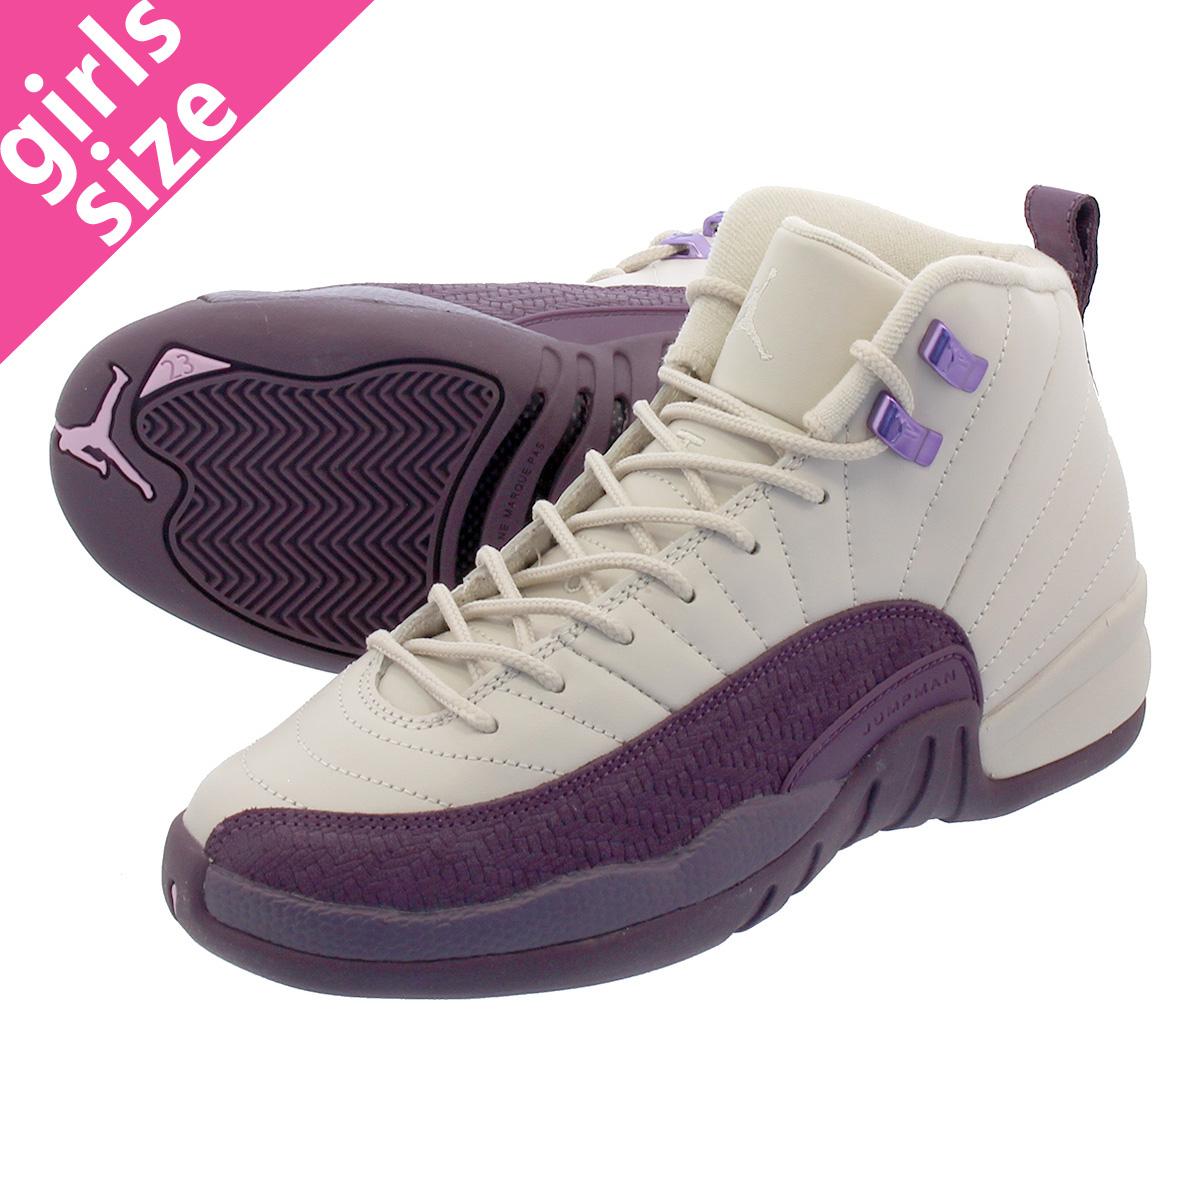 LOWTEX PLUS  NIKE AIR JORDAN 12 RETRO GS Nike Air Jordan 12 nostalgic GS  DESERT SAND DESERT SAND PRO PURPLE 510 b89d5d729